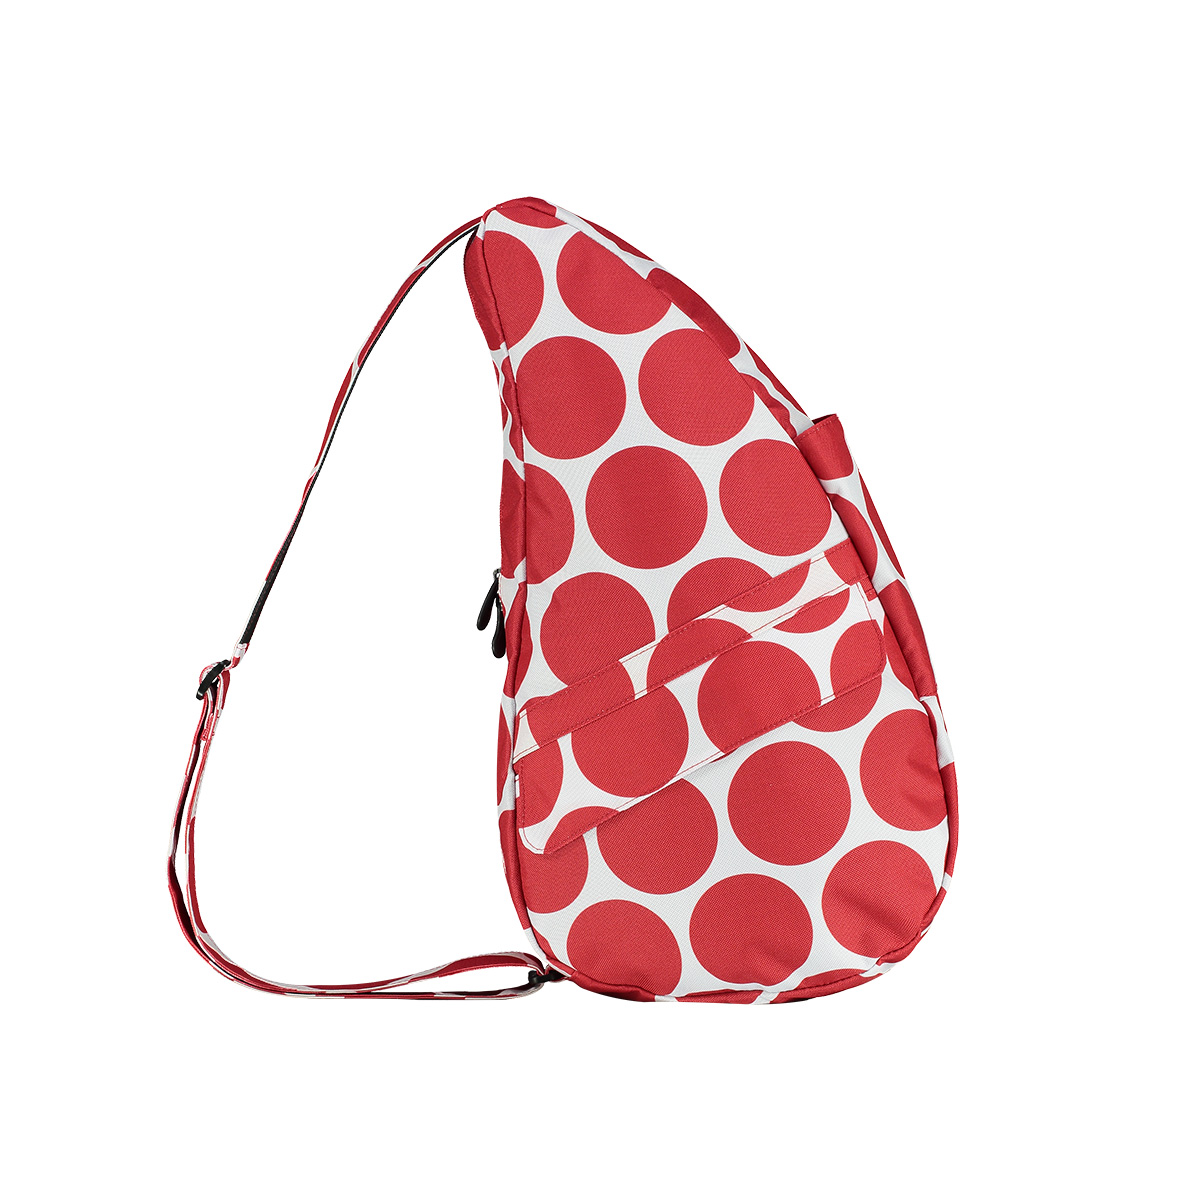 Healthy Back Bag/ヘルシーバックバッグ/ショルダーバッグ/ボディバッグ/旅行バッグ/軽量/レディース/メンズ 《限定ポーチ付》 公式ストア ヘルシーバックバッグ プリント Mサイズ ヒノマル